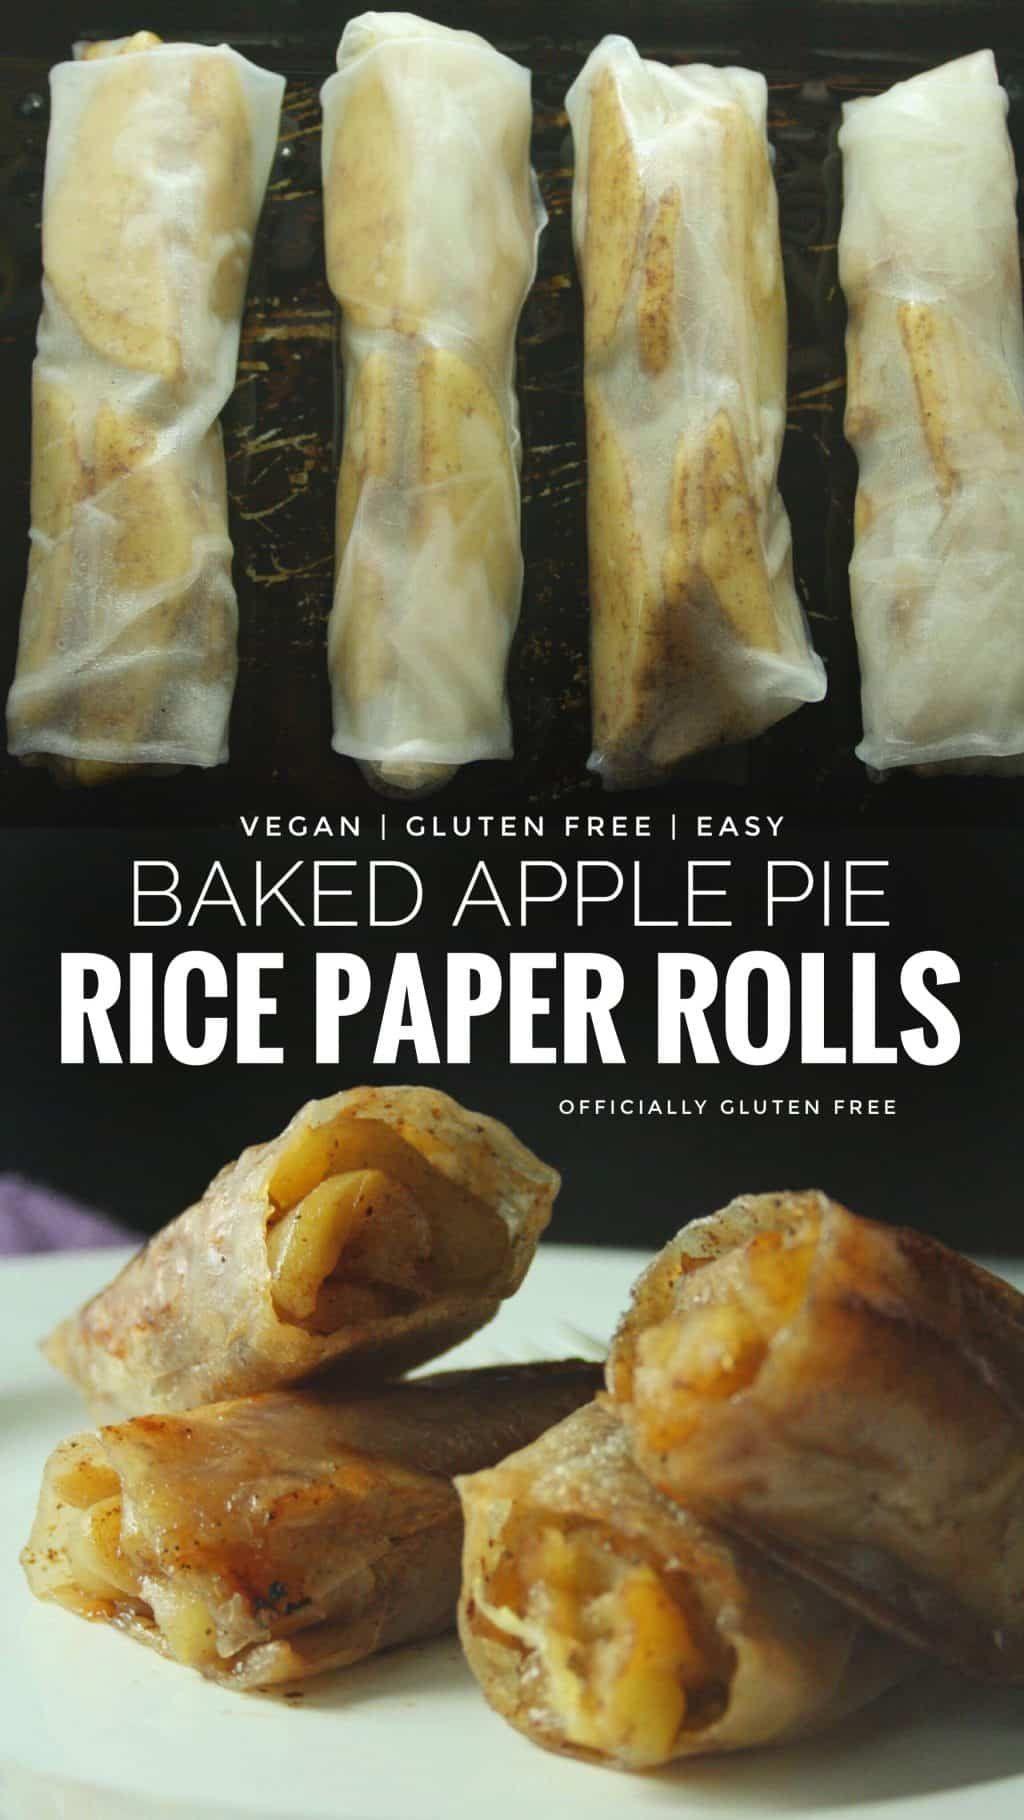 Baked Apple Pie Rice Paper Rolls | Gluten Free | Vegan | Apple Pie Rolls